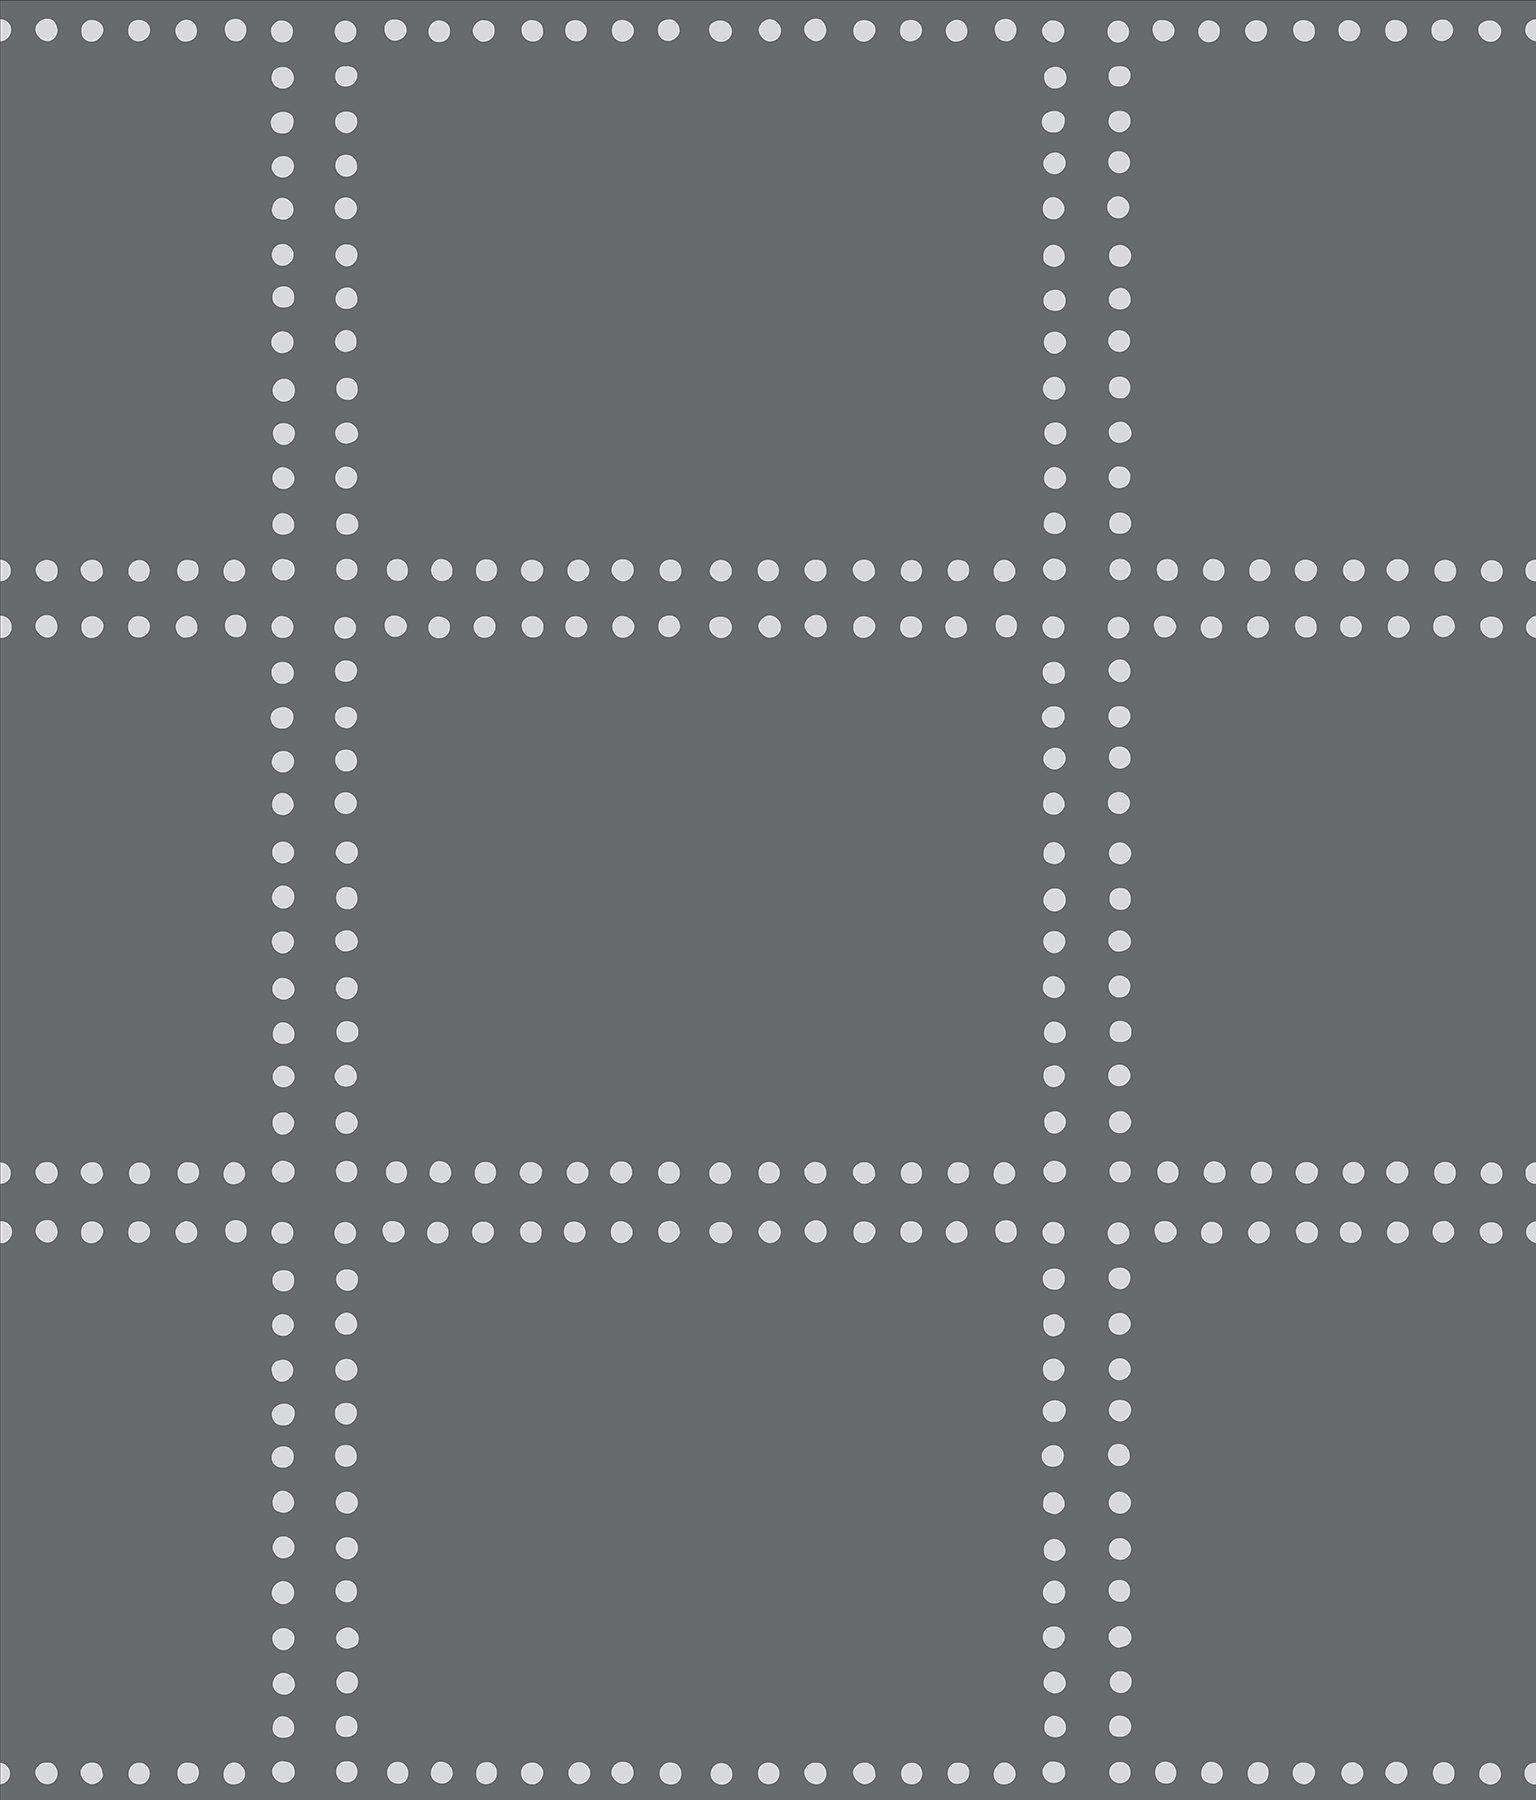 A-Street Prints 2697-22639 Gridlock Charcoal Geometric Wallpaper,